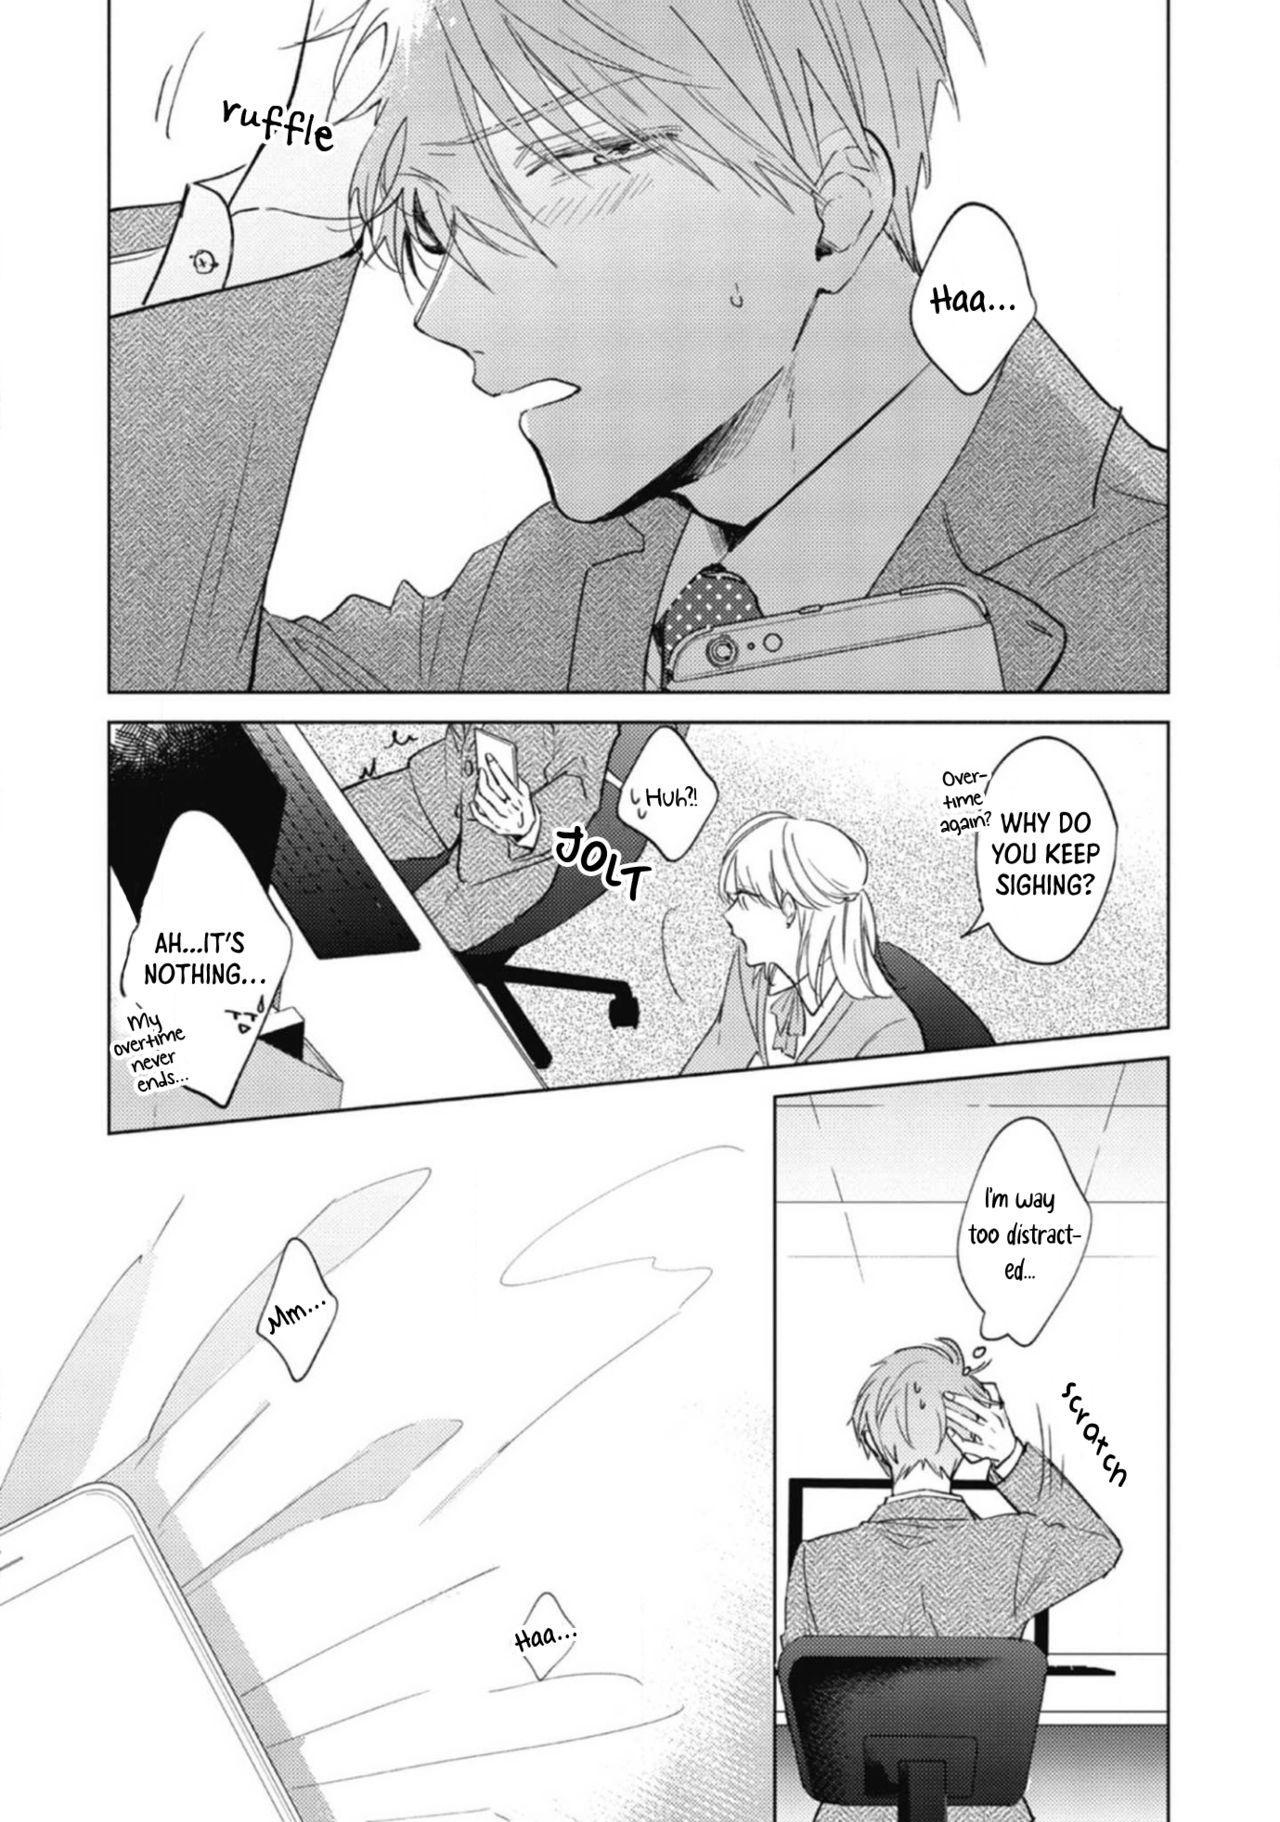 Oni Joushi Gokudera-san wa Abakaretai   My demon boss, Gokudera wants to be exposed 1 24